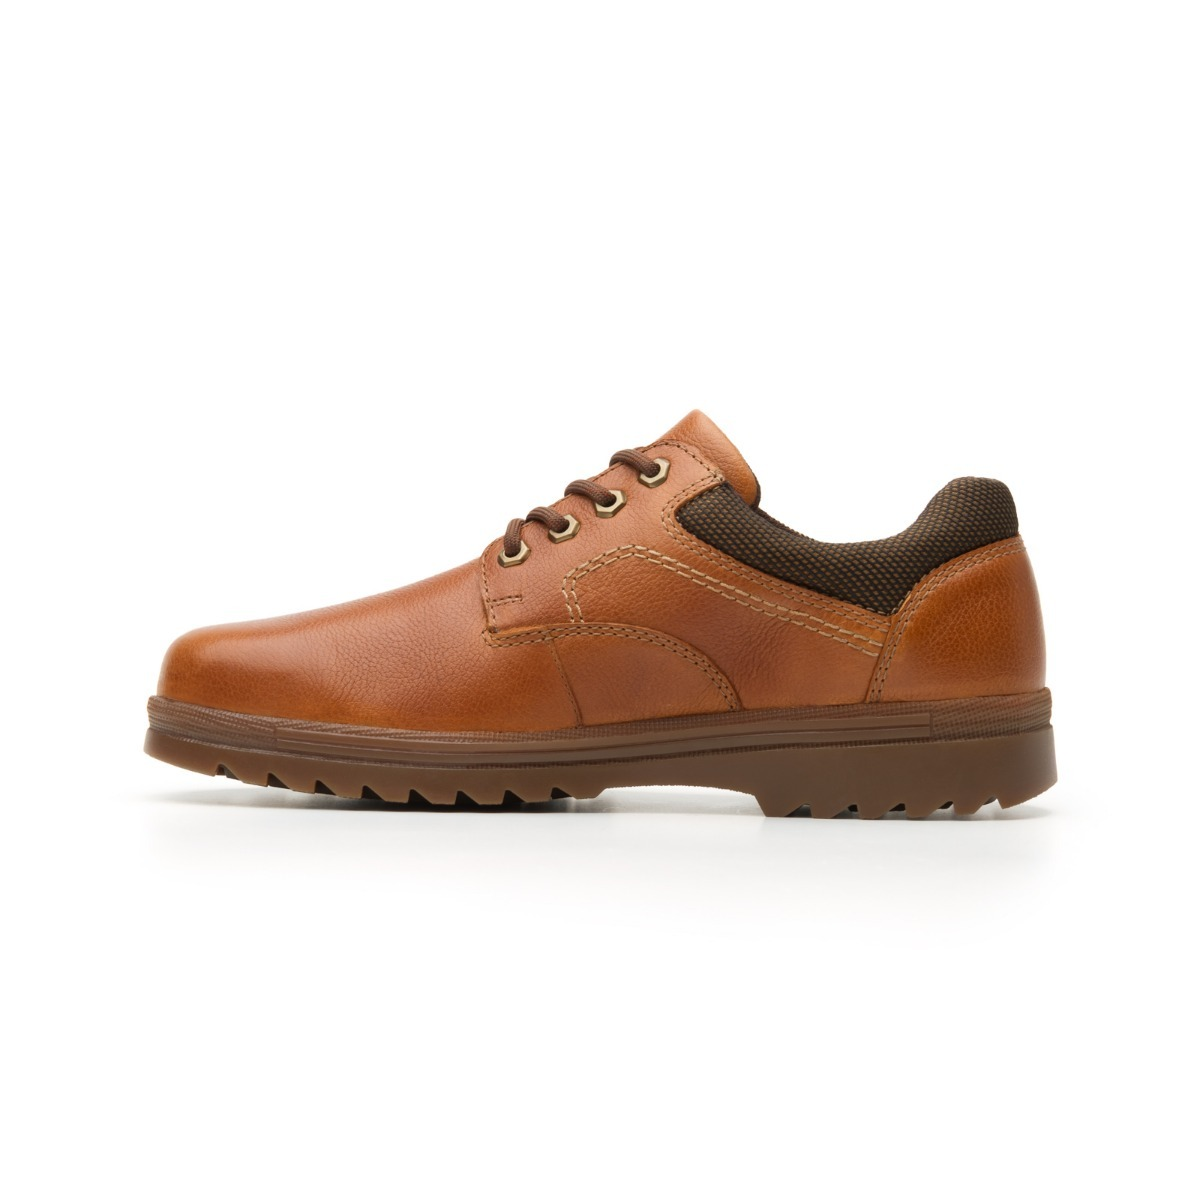 7d6031a4 Flexi Country Zapatos Piel Casual Outdoor Derby 1923471 - $ 1,259.90 ...